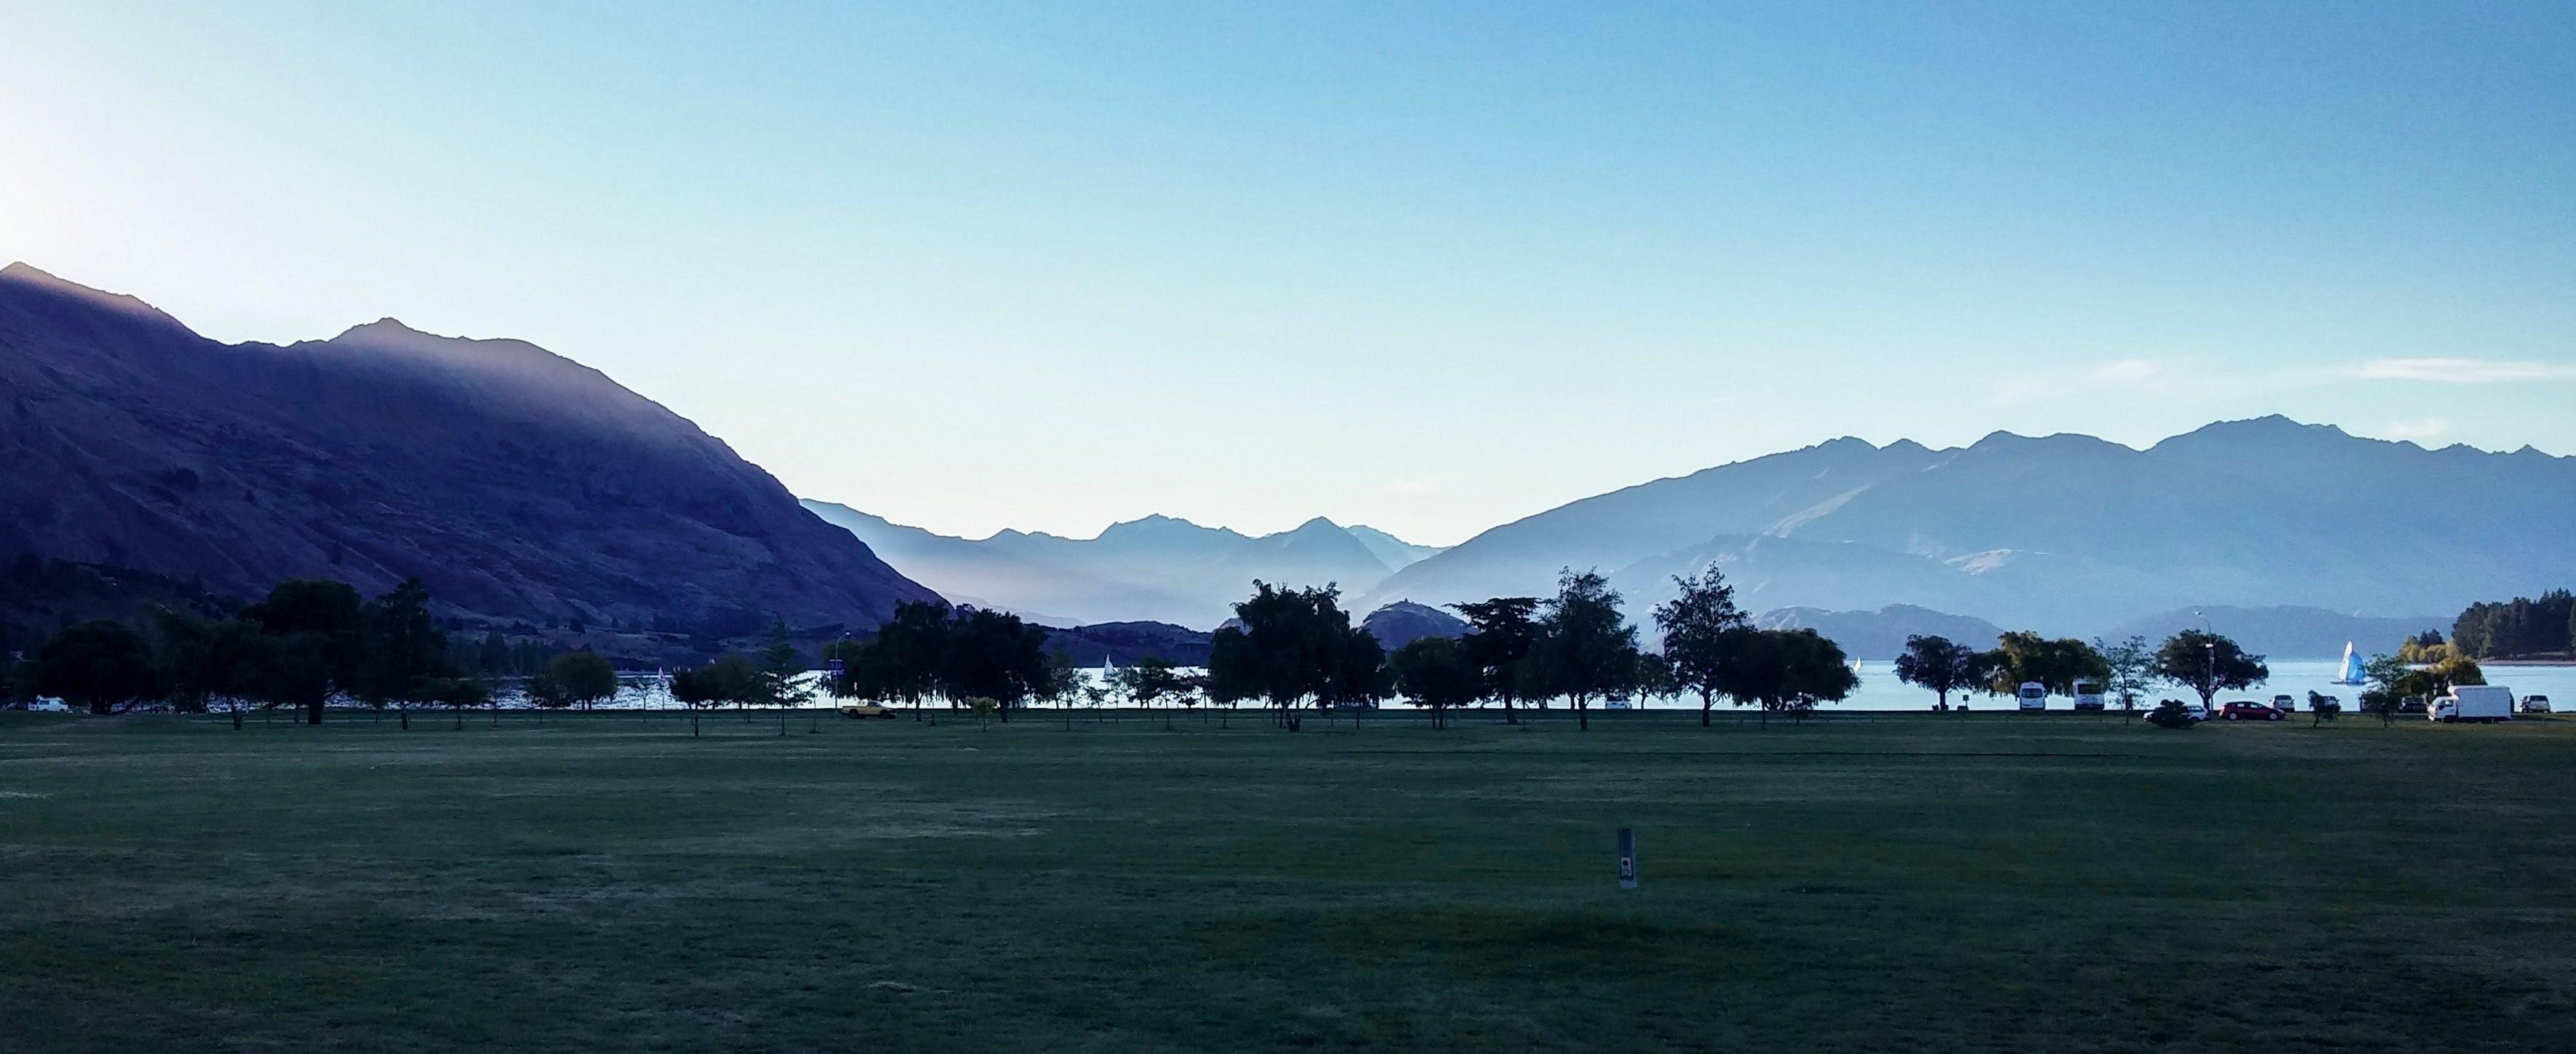 Безкоштовне стокове фото на тему «вода, гора, гори, Денне світло»